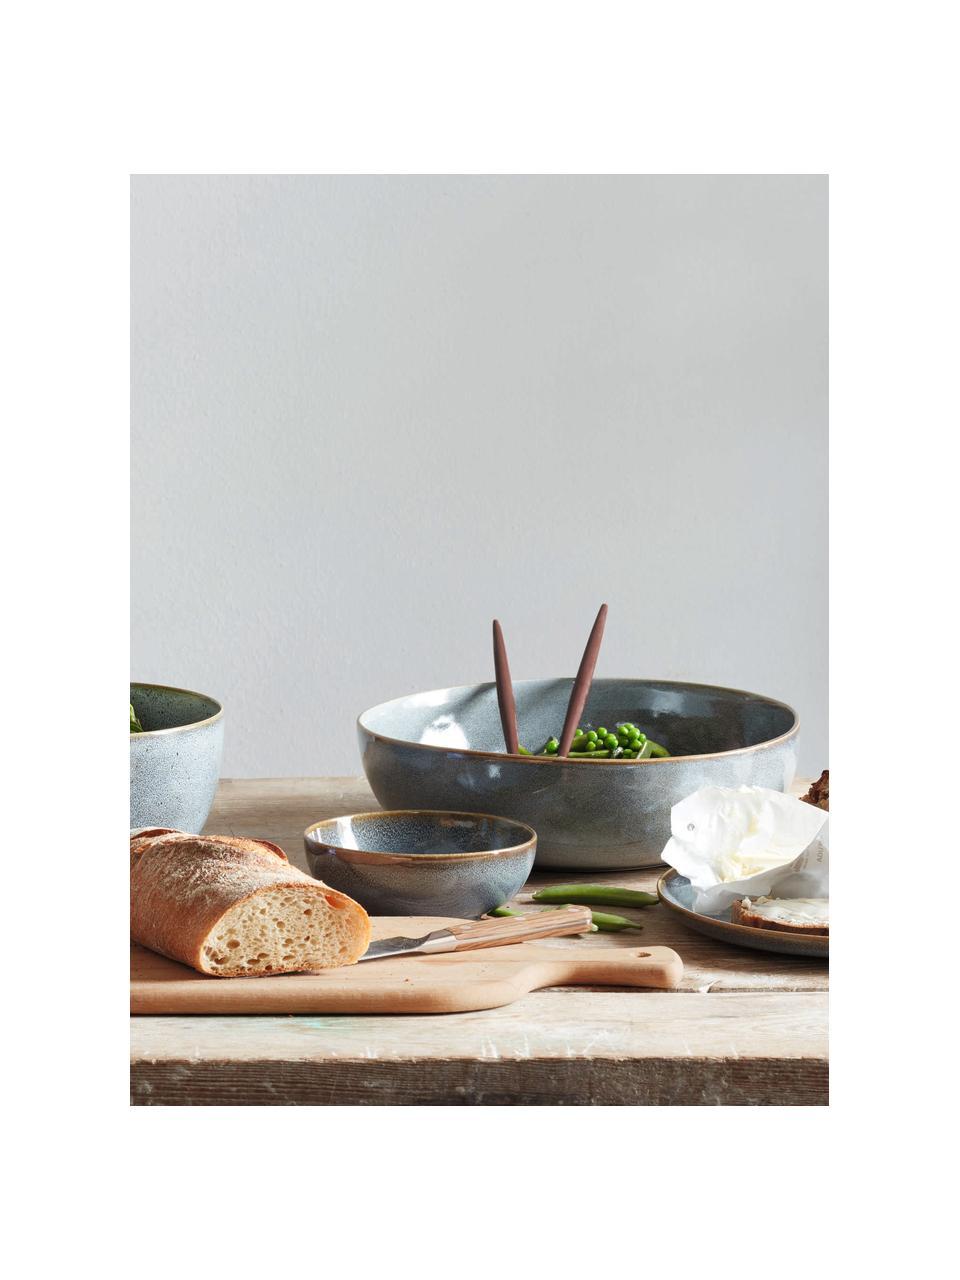 Mokken Saisons van keramiek in blauw, 6 stuks, Keramiek, Blauw, Ø 15 x H 5 cm